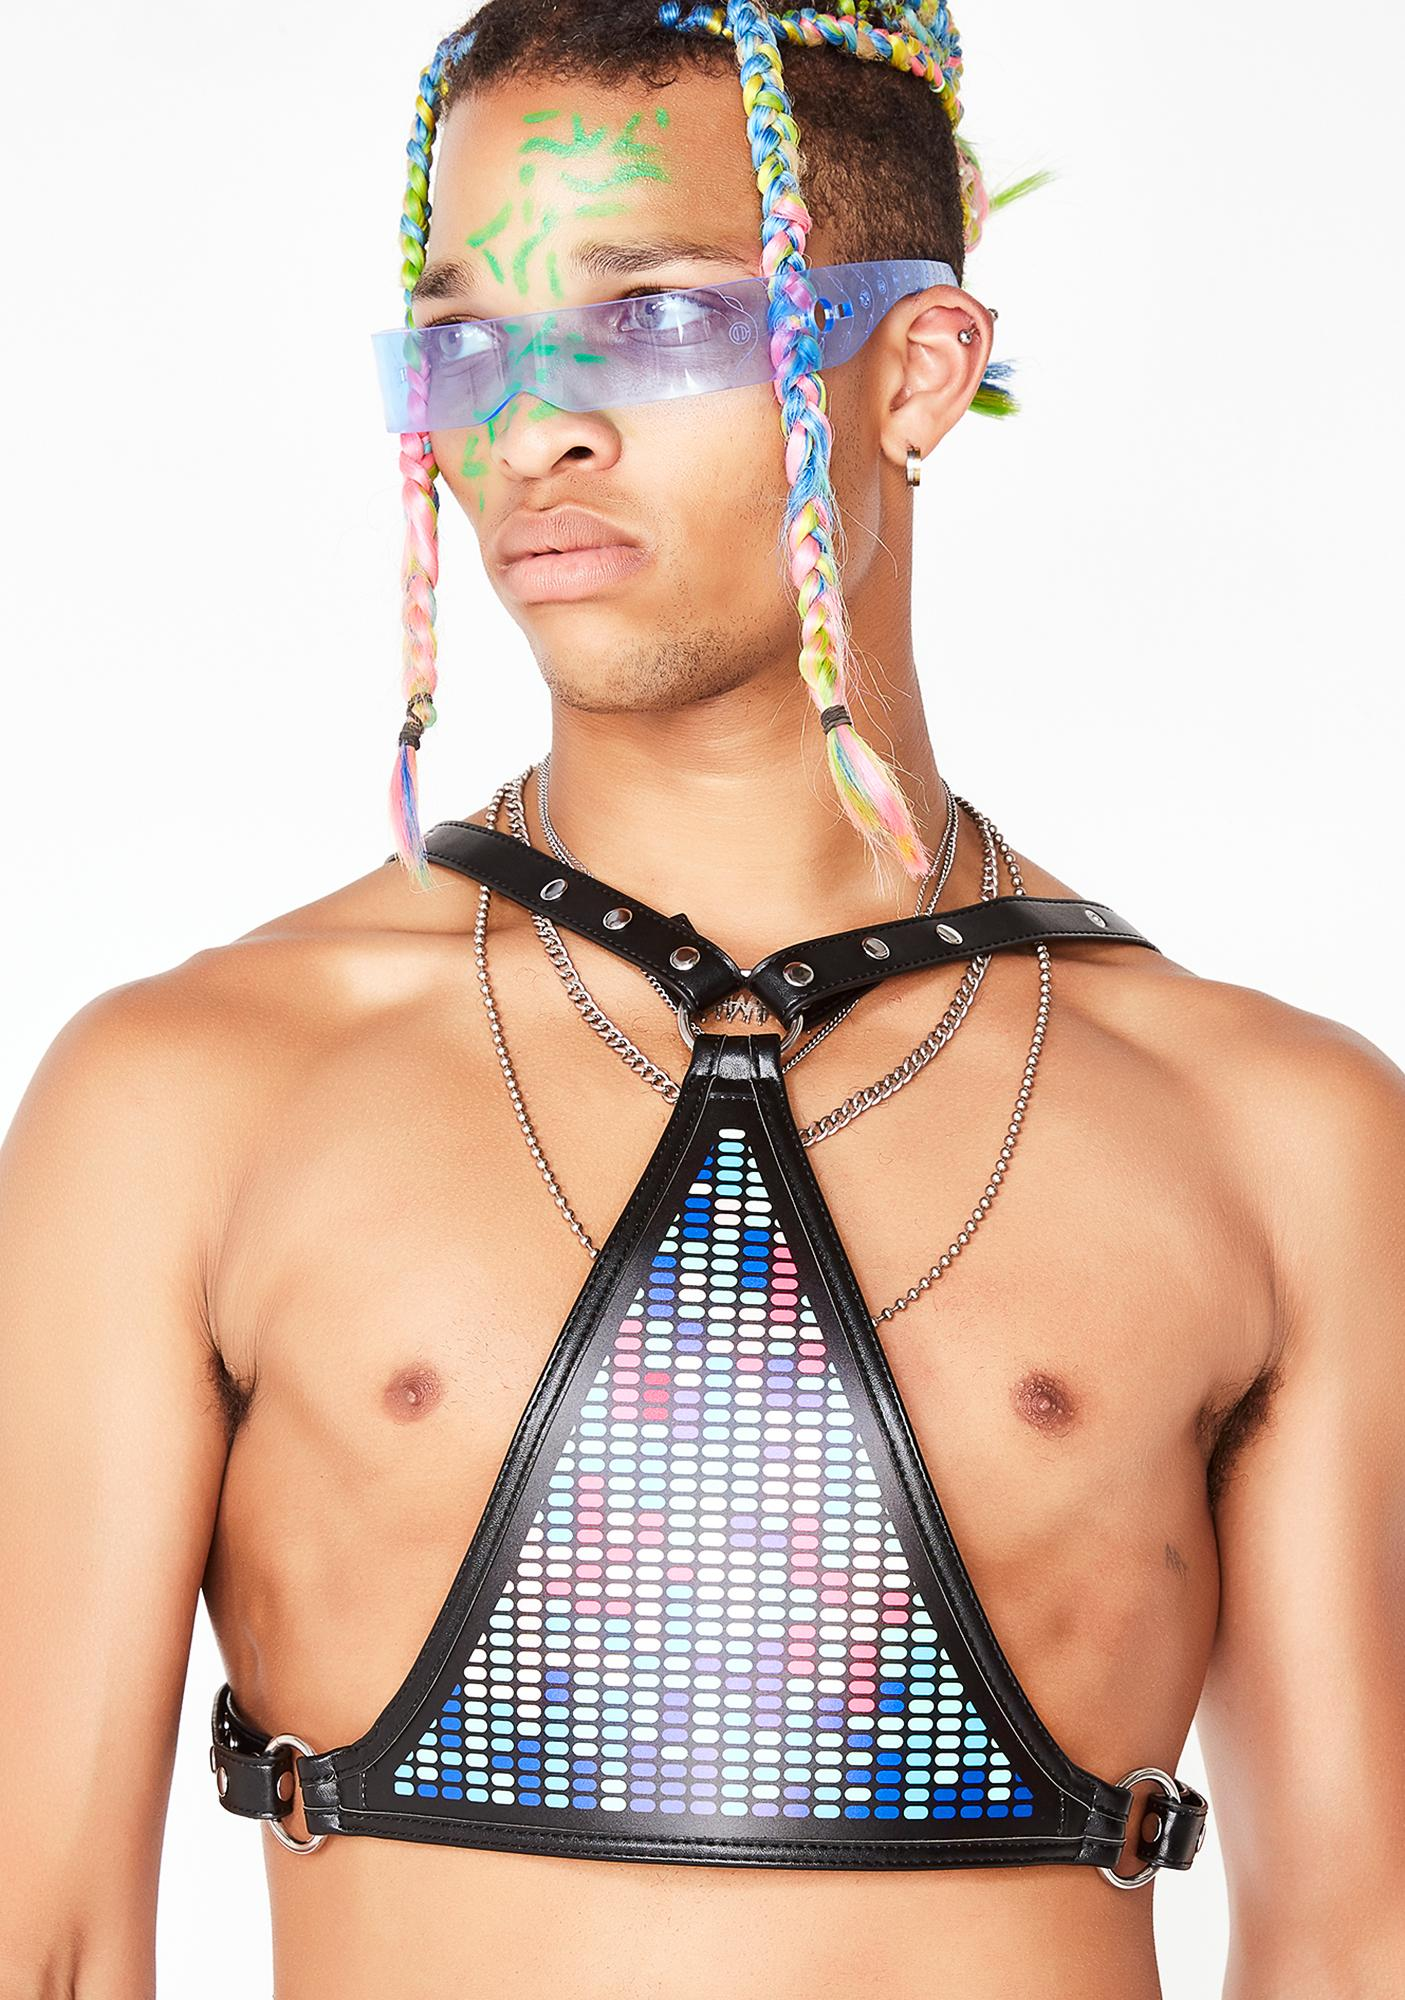 Club Exx Light Wavez Sound Reactive Harness